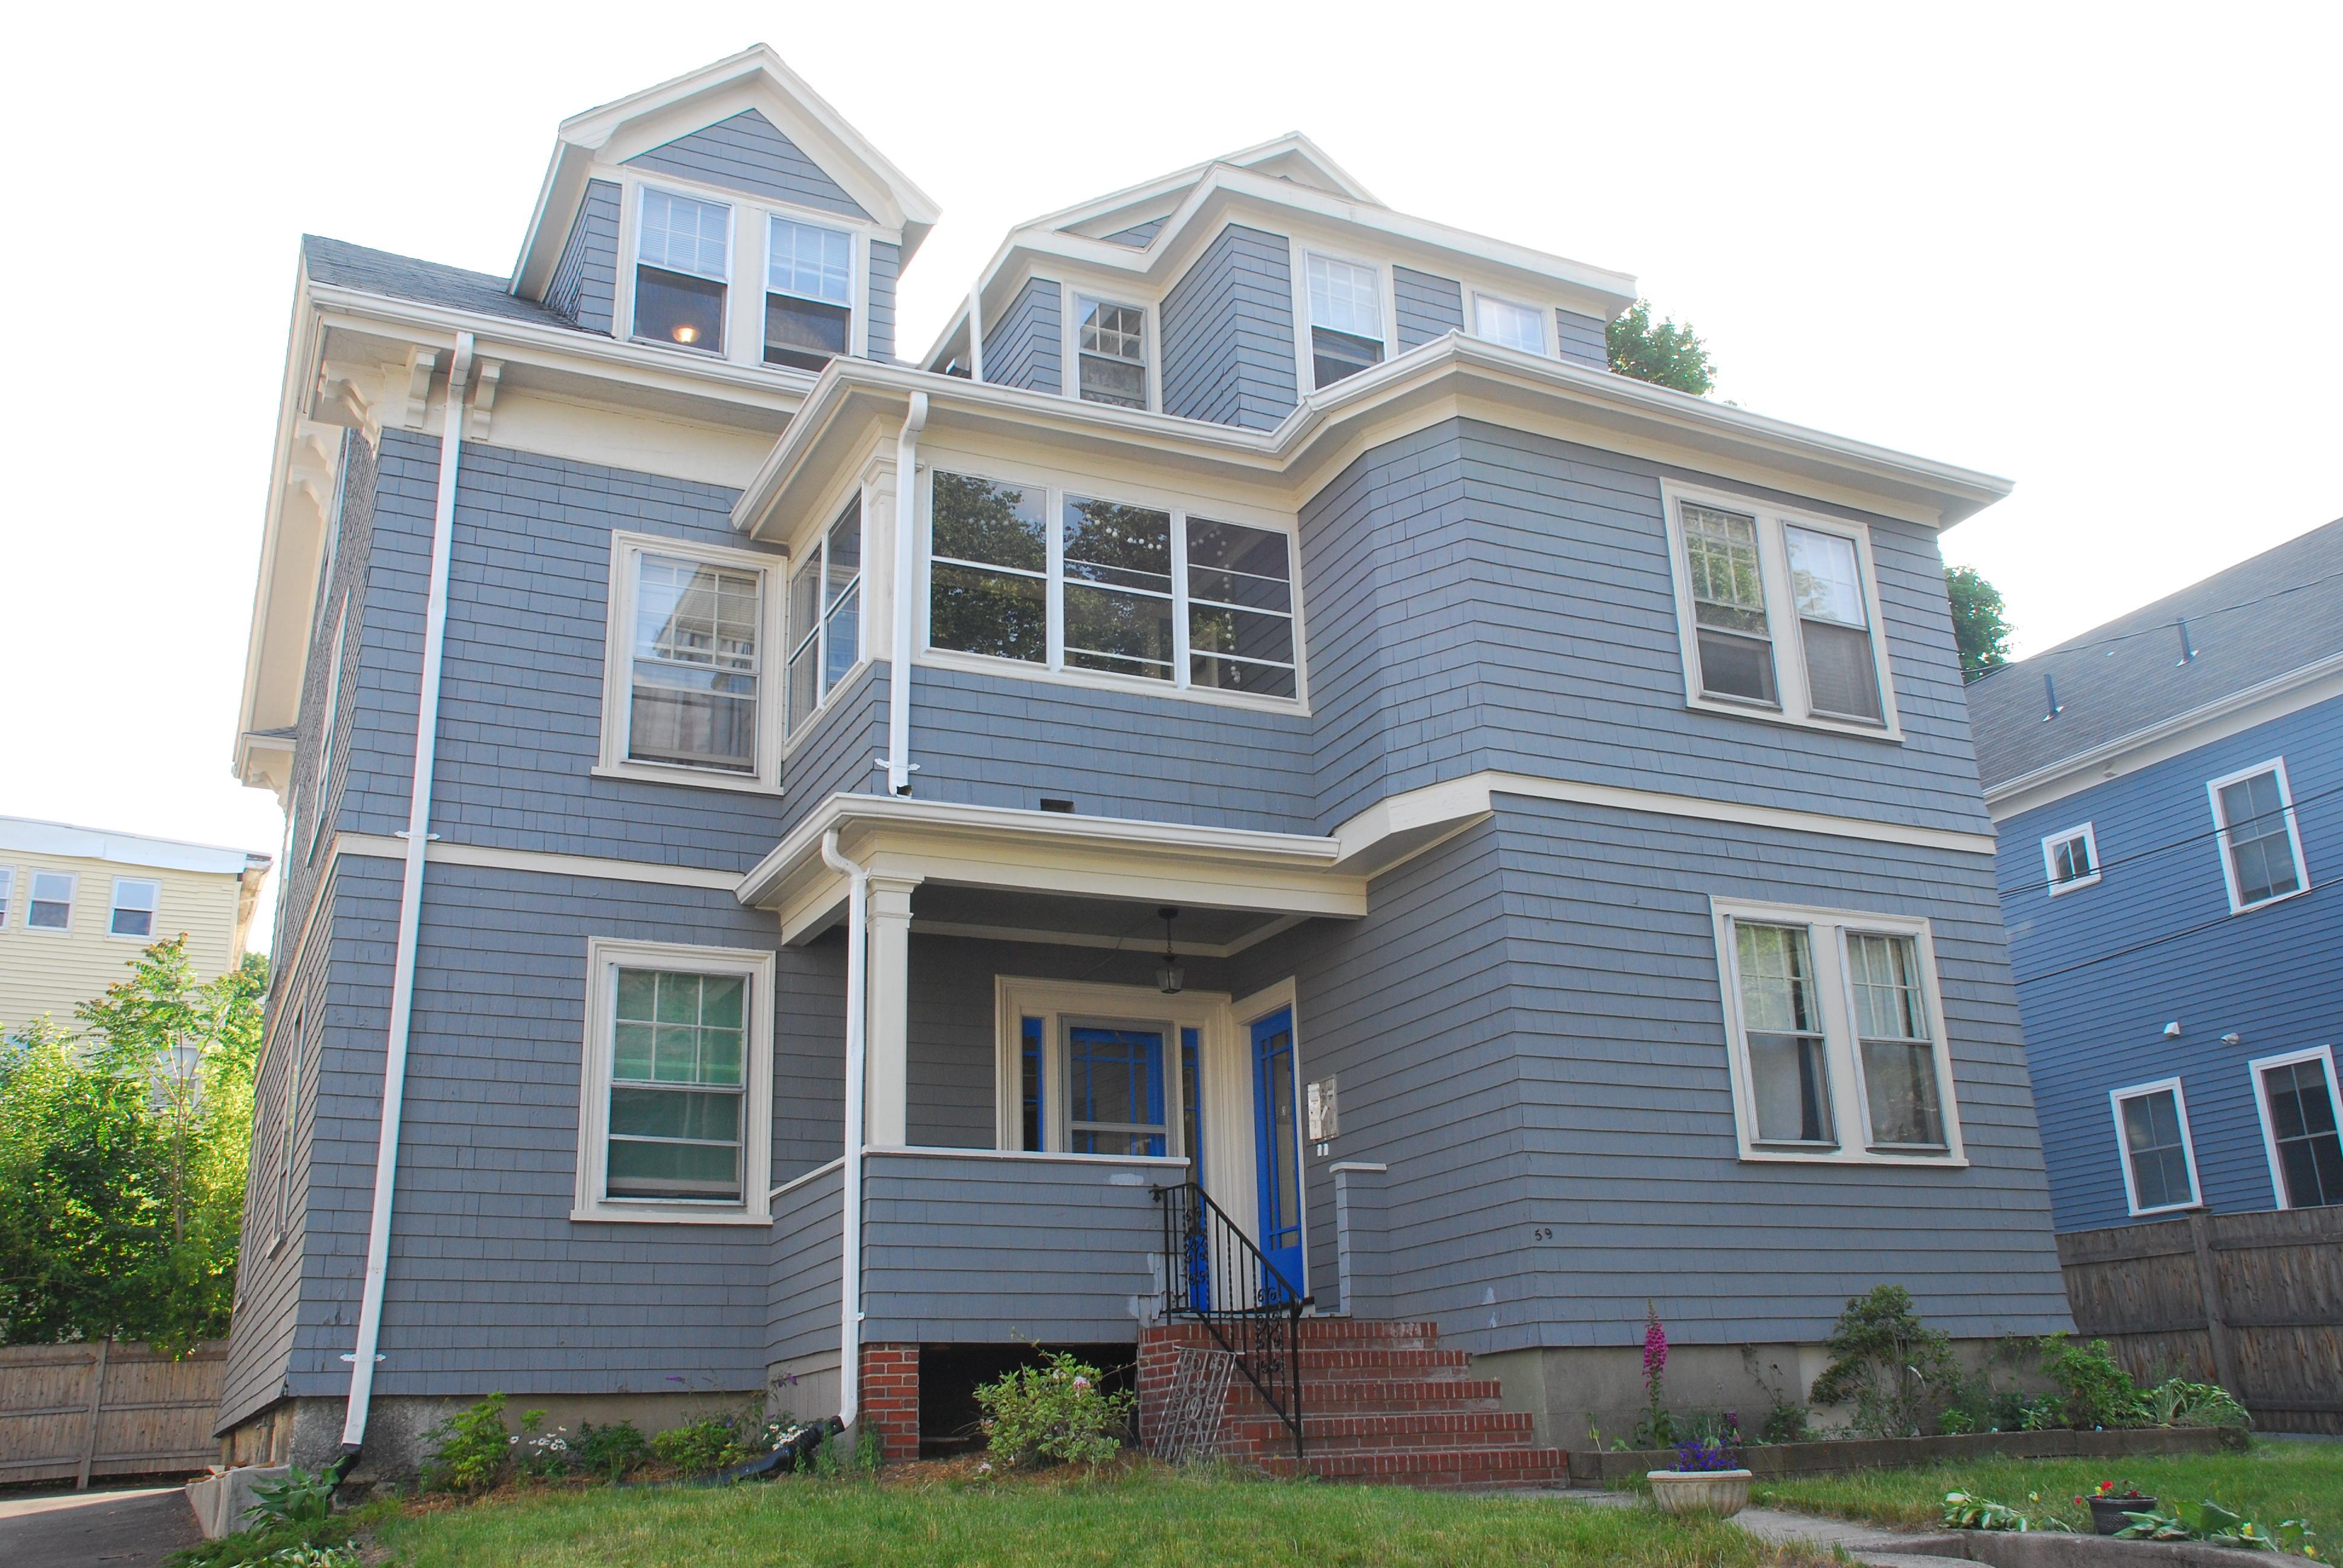 Condominium for Sale at 59 Wyman Street #3 59 Wyman St #3 Boston, Massachusetts 02130 United States